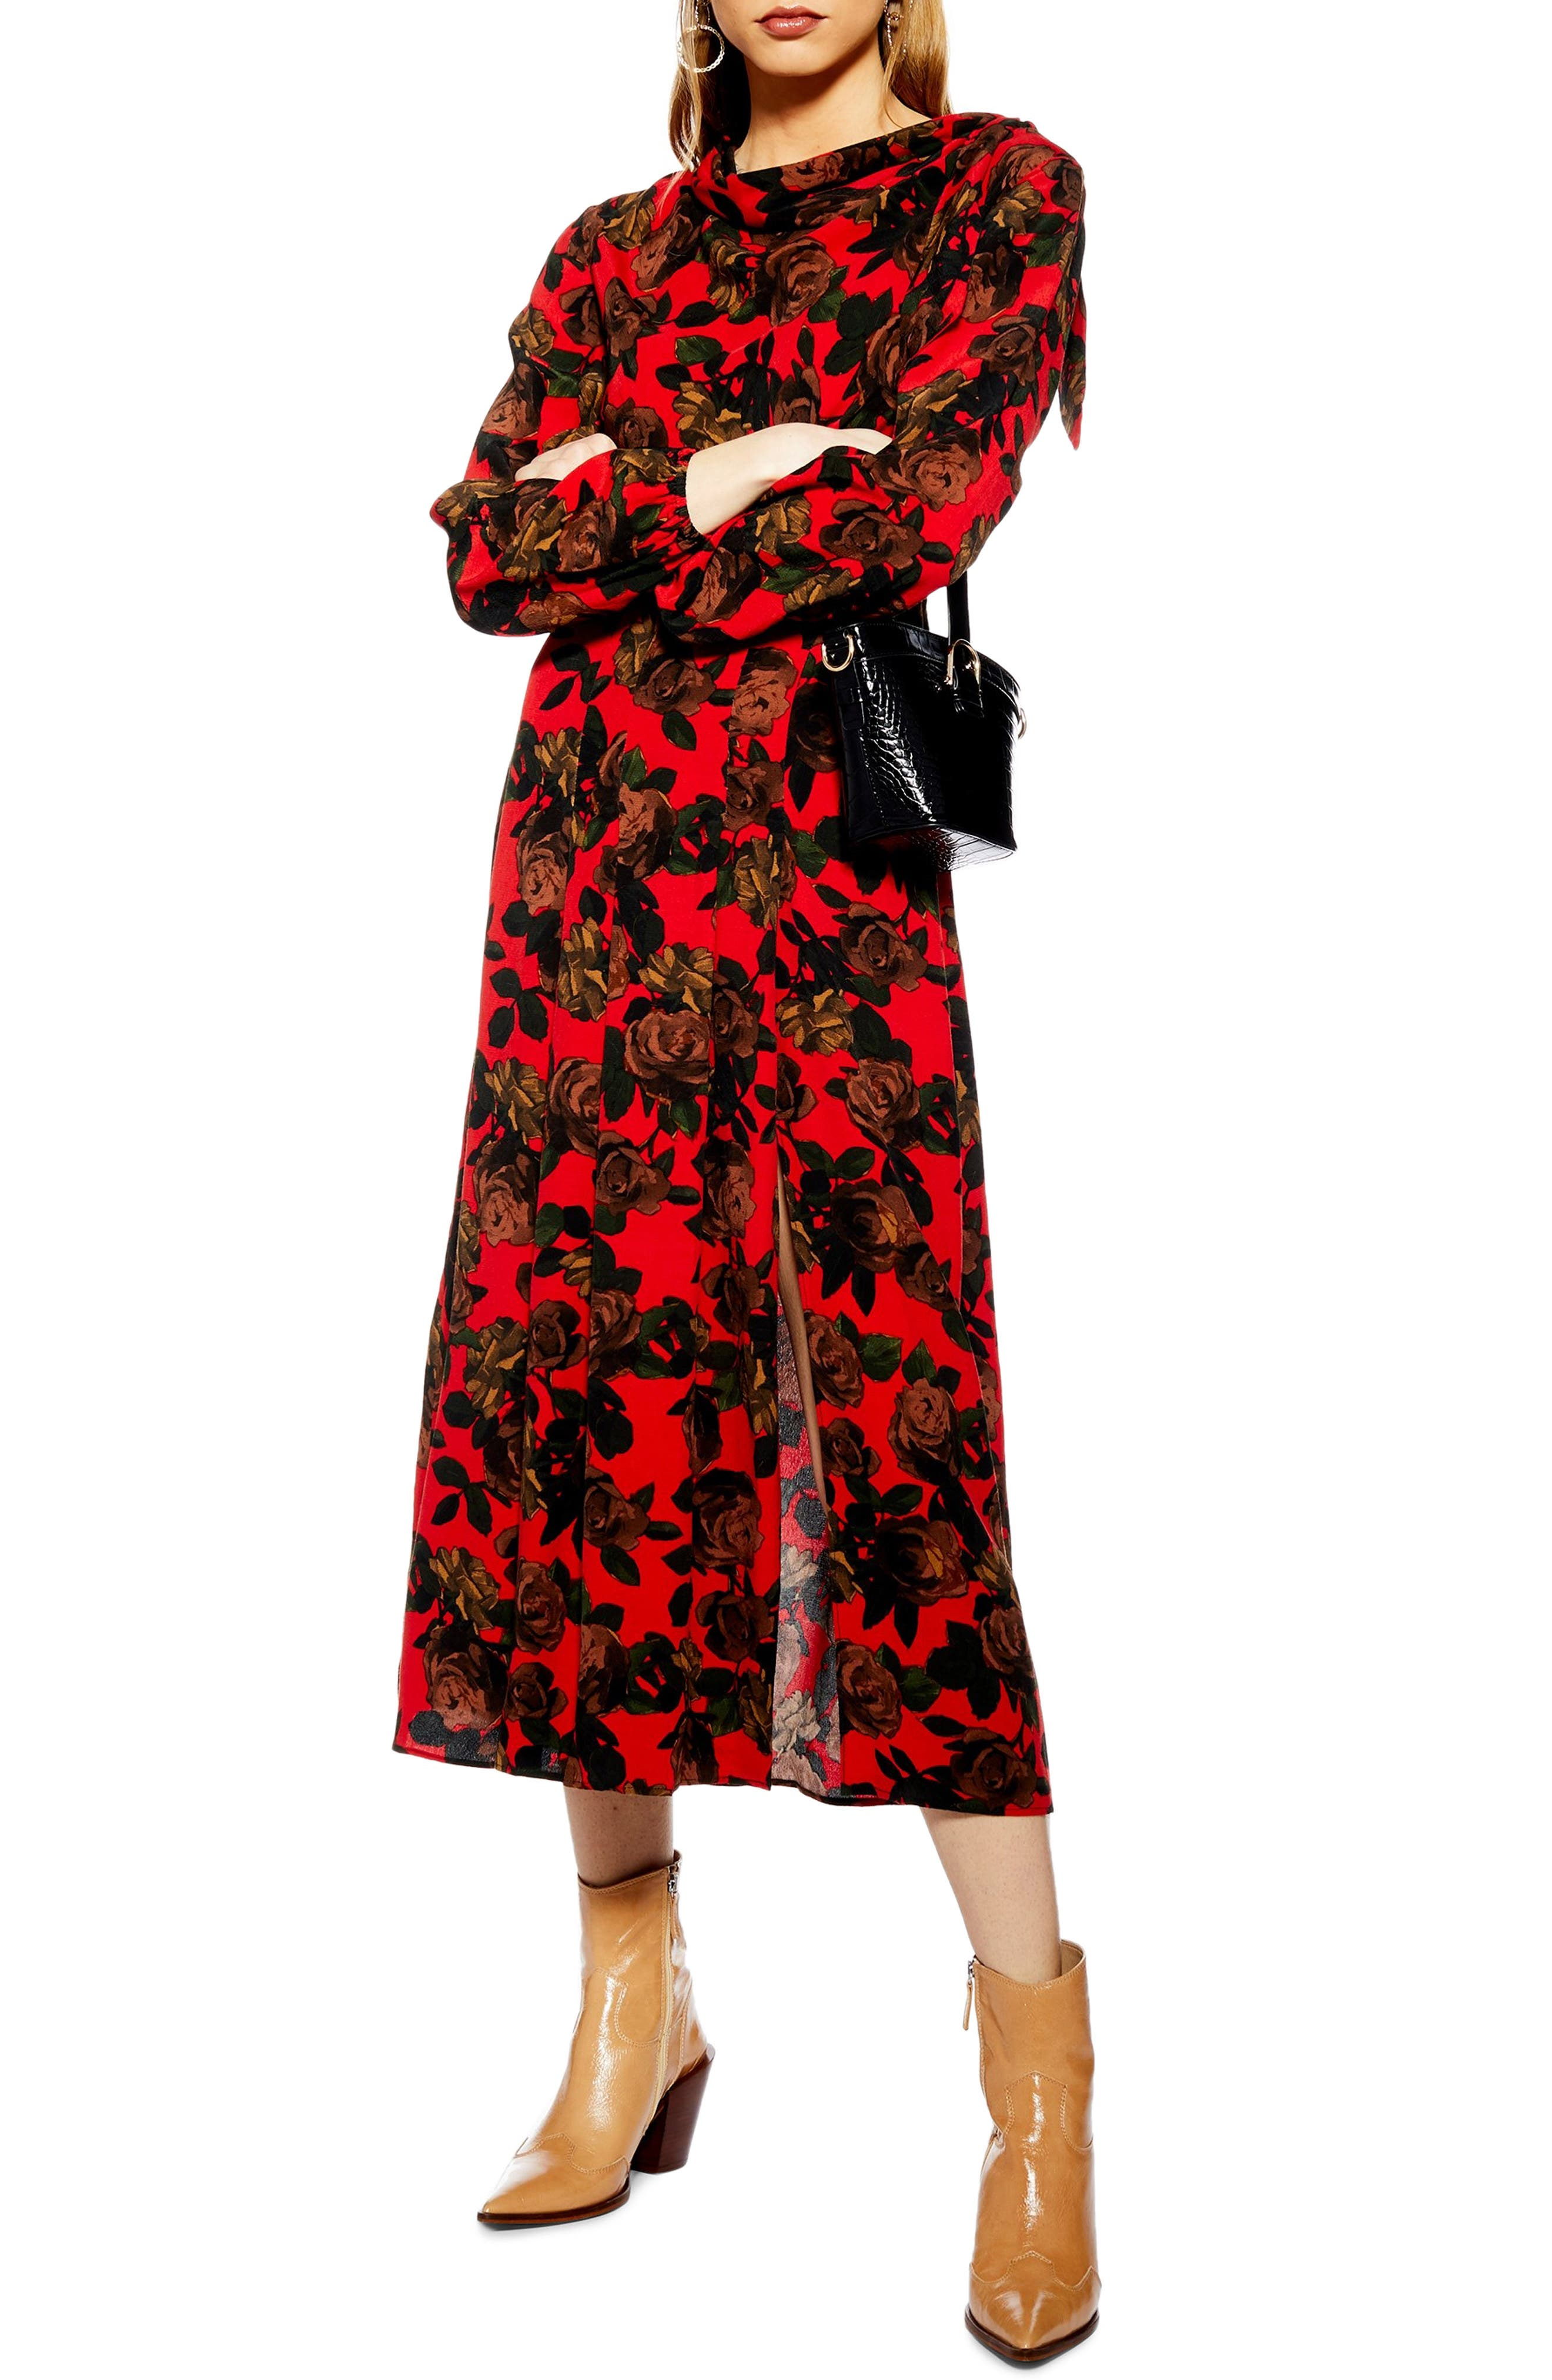 Topshop Rose Cut Tie Neck Midi Dress, US (fits like 0) - Red